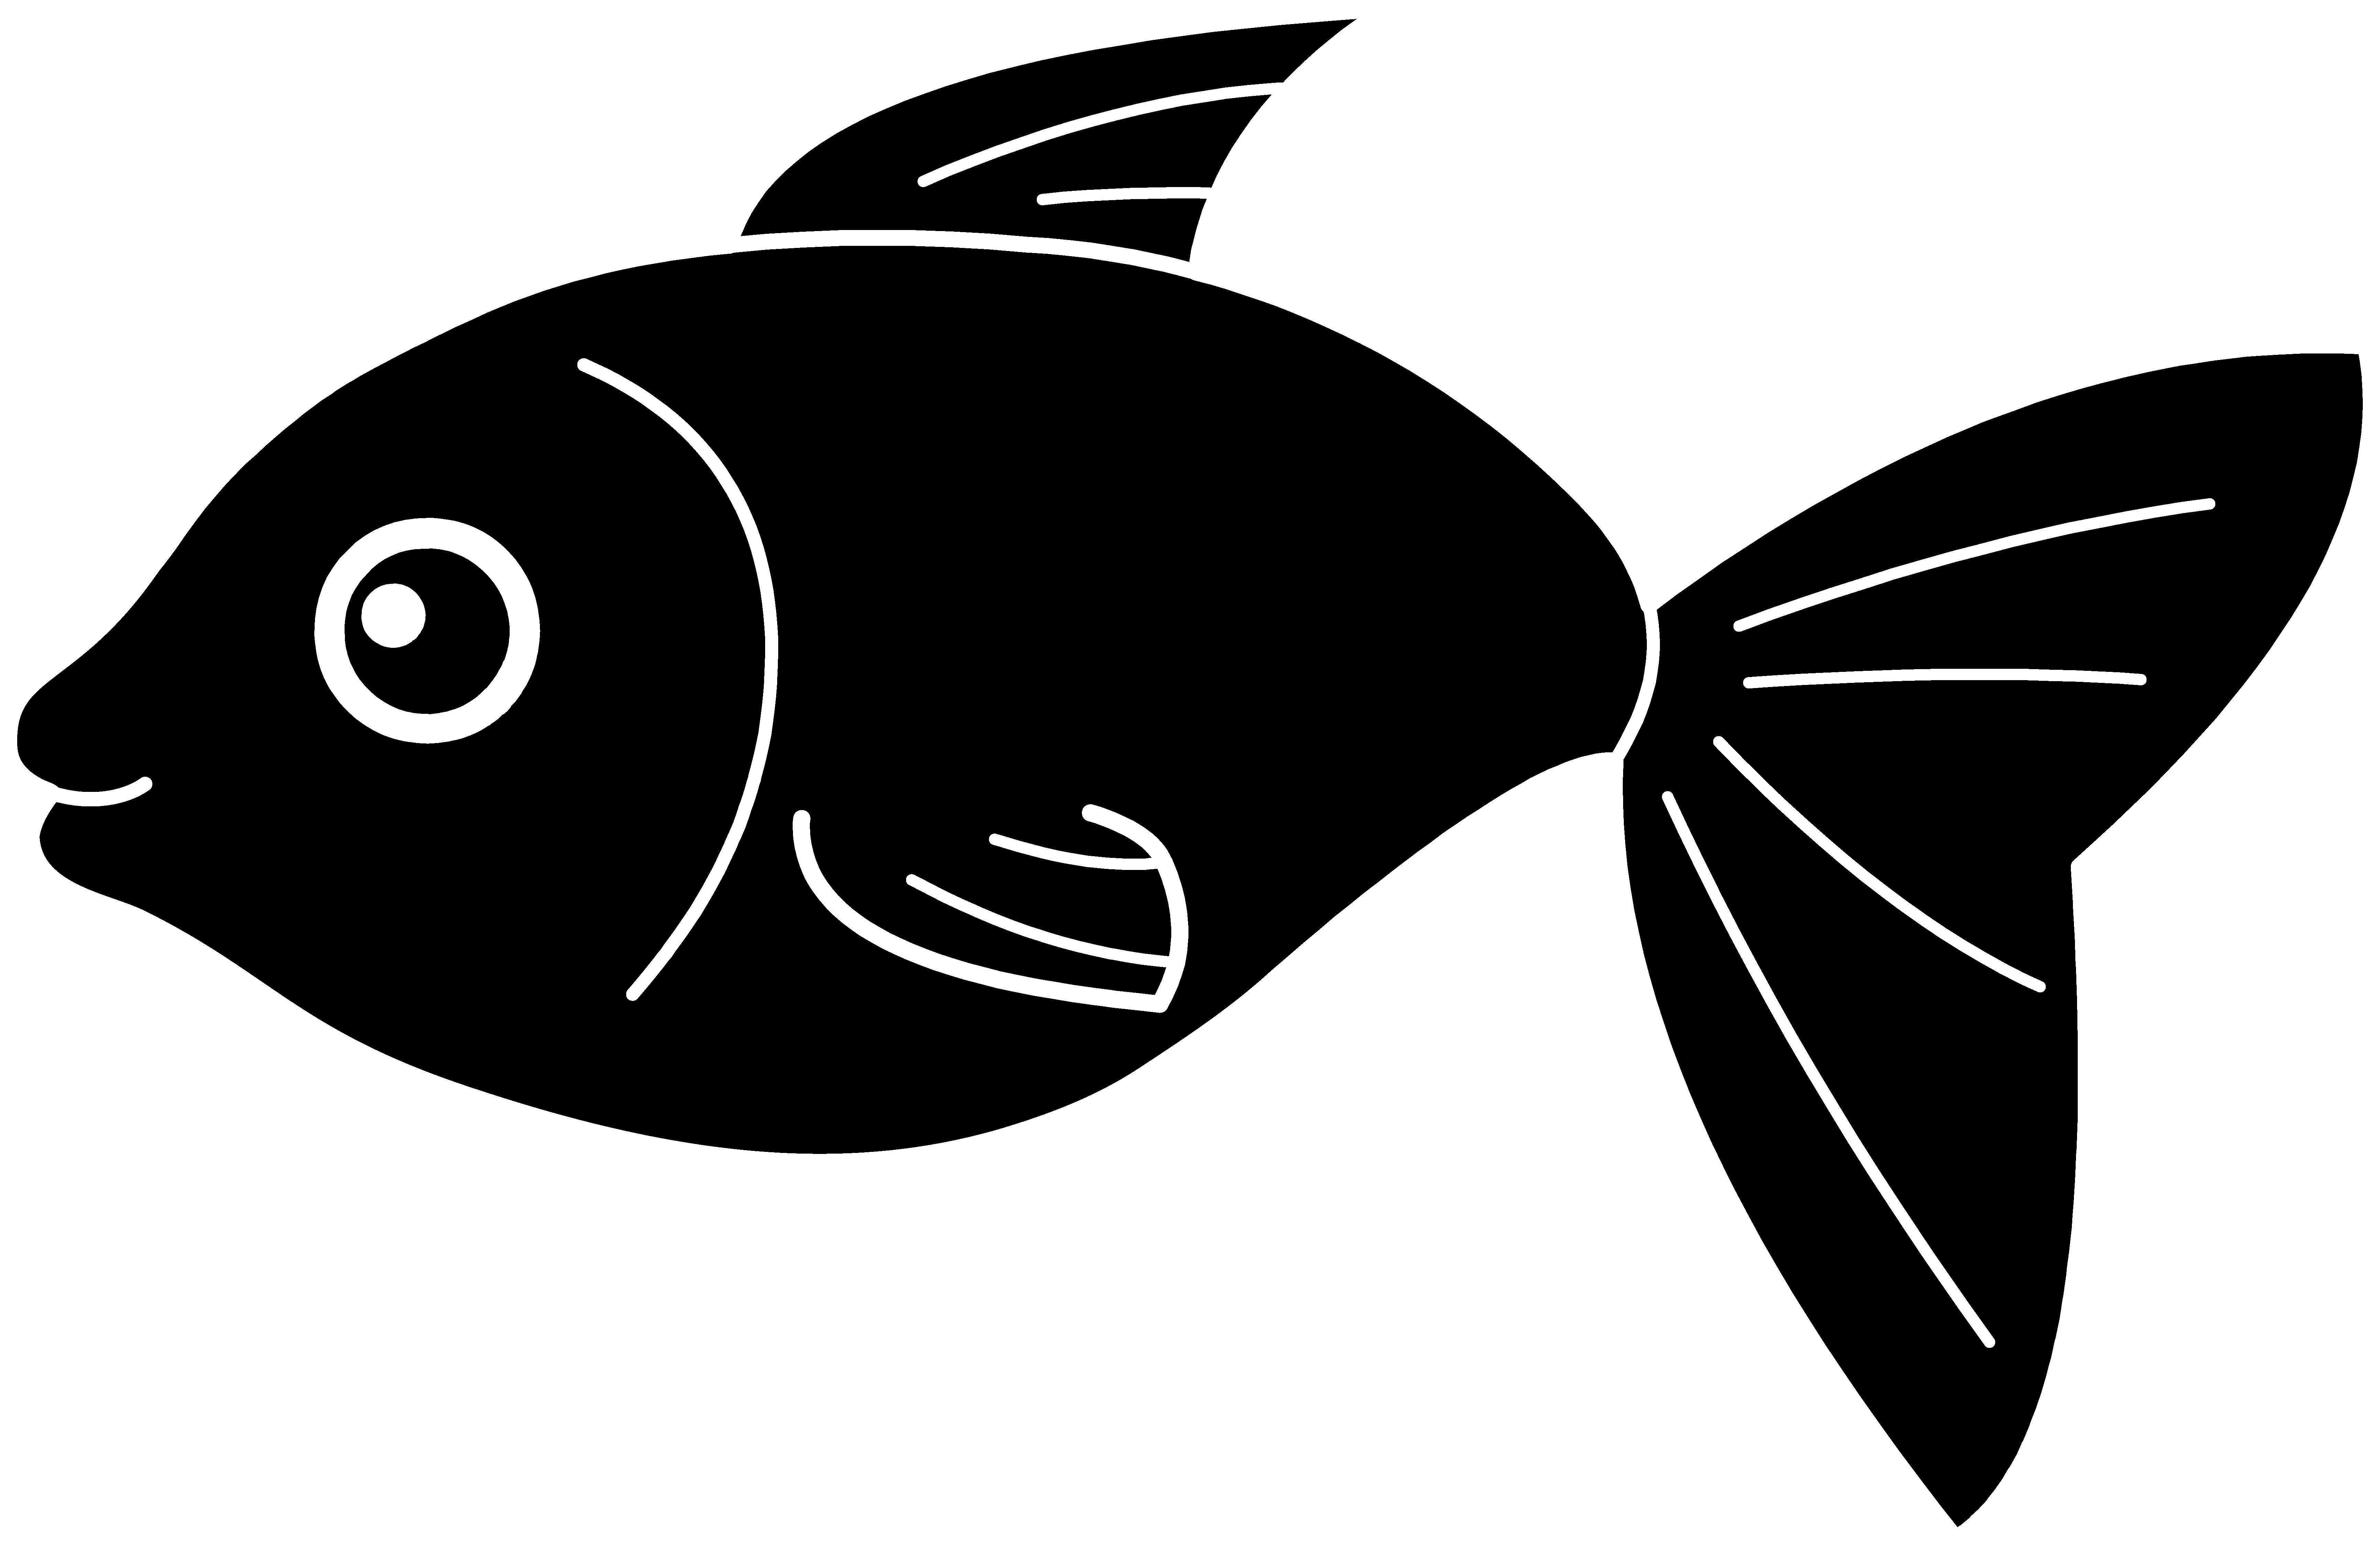 Fishing clipart bass. Black fish silhouette free